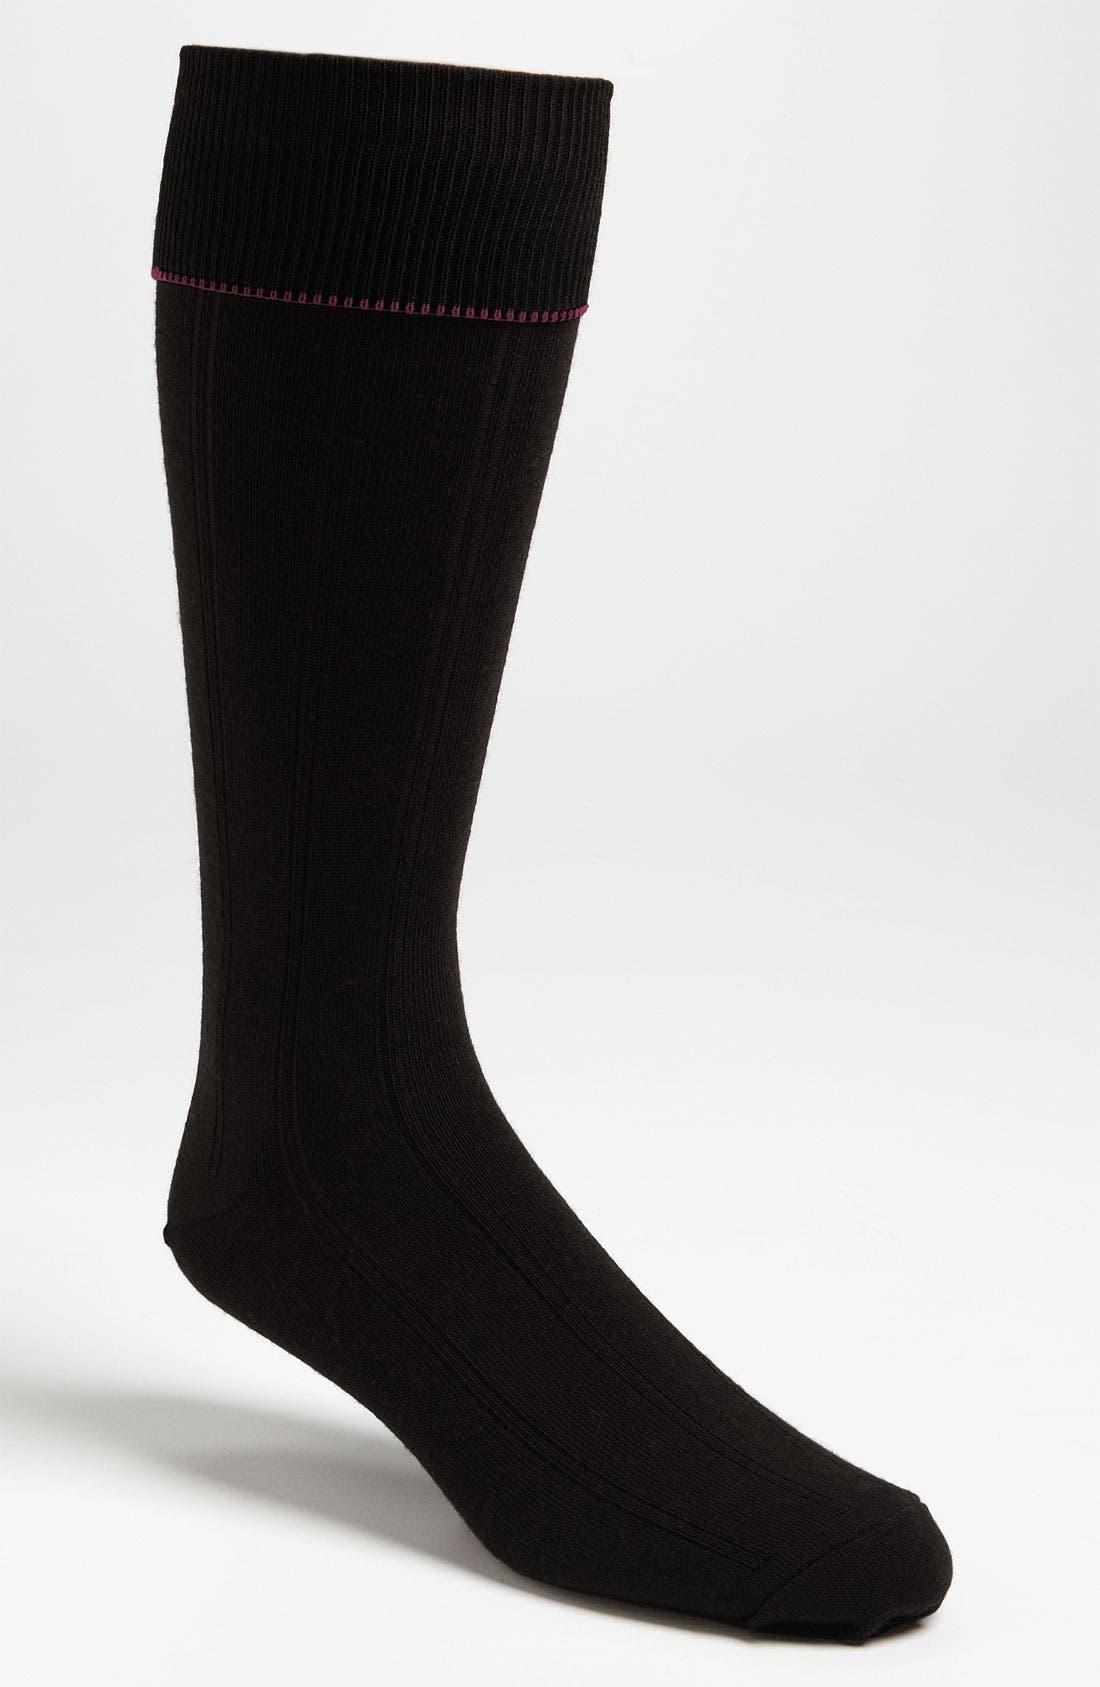 Nordstrom Mens Shop Over the Calf Wool Socks,                         Main,                         color, BLACK